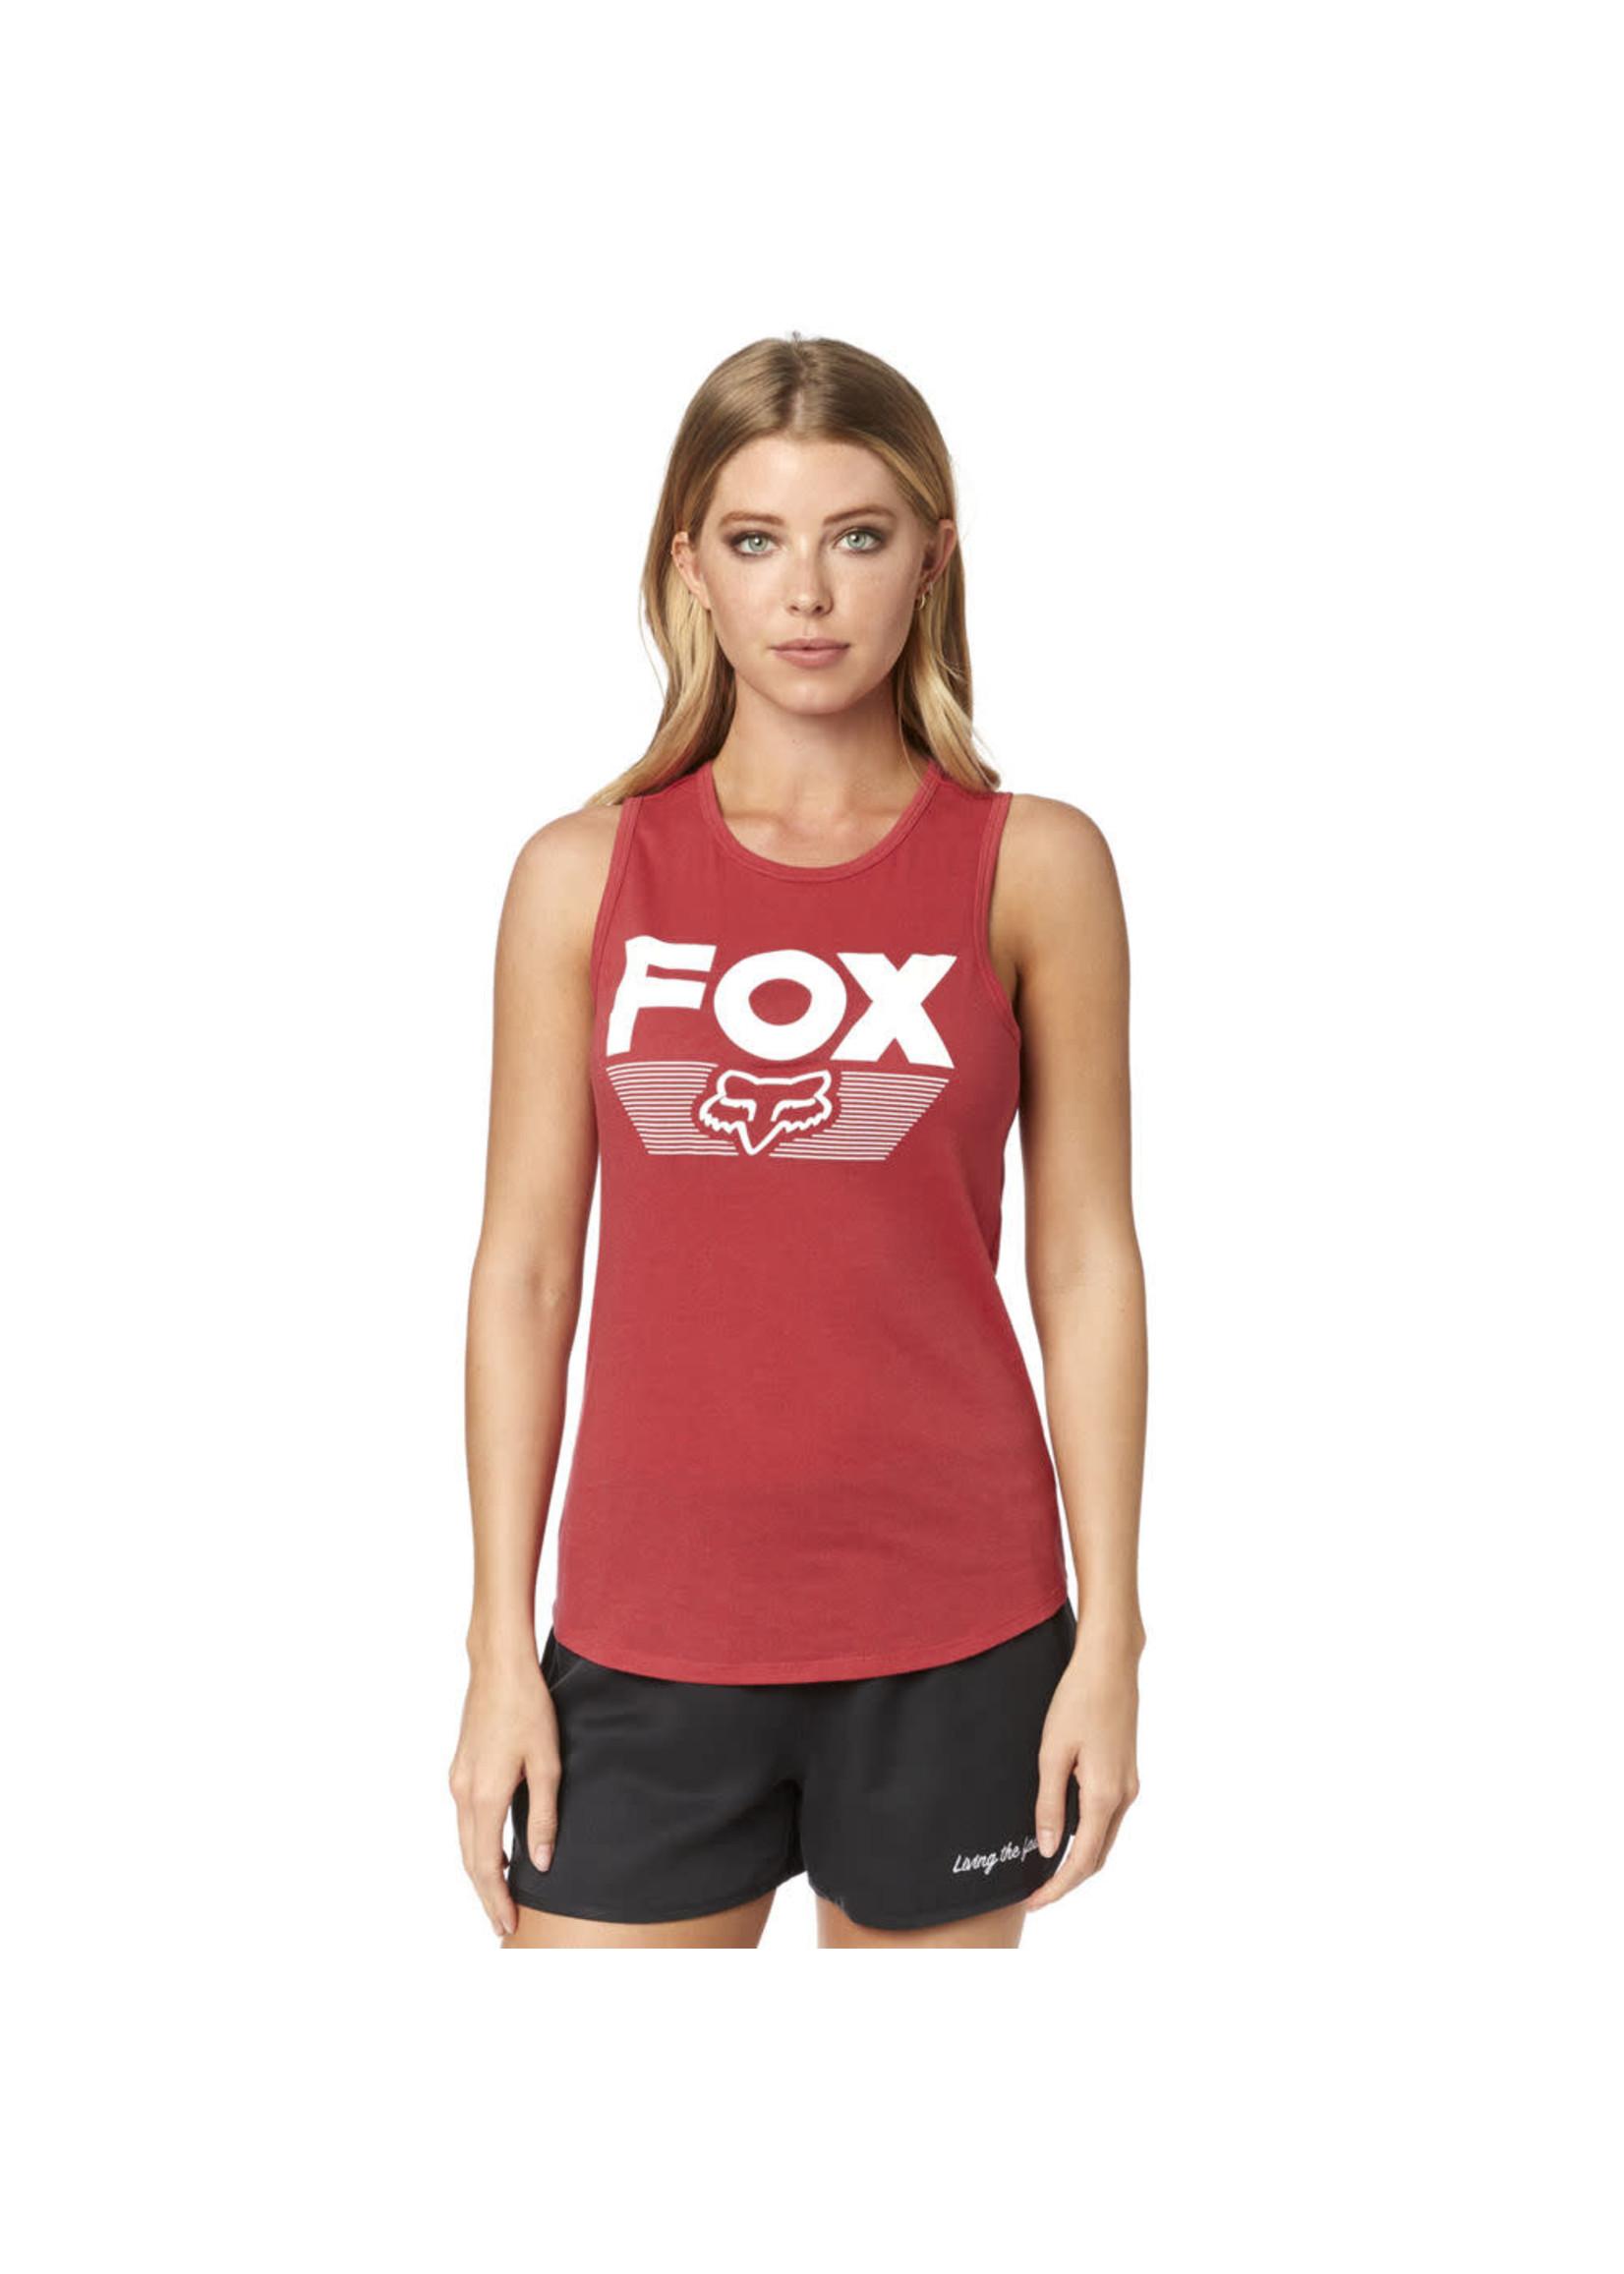 Fox ASCOT TANK 22851